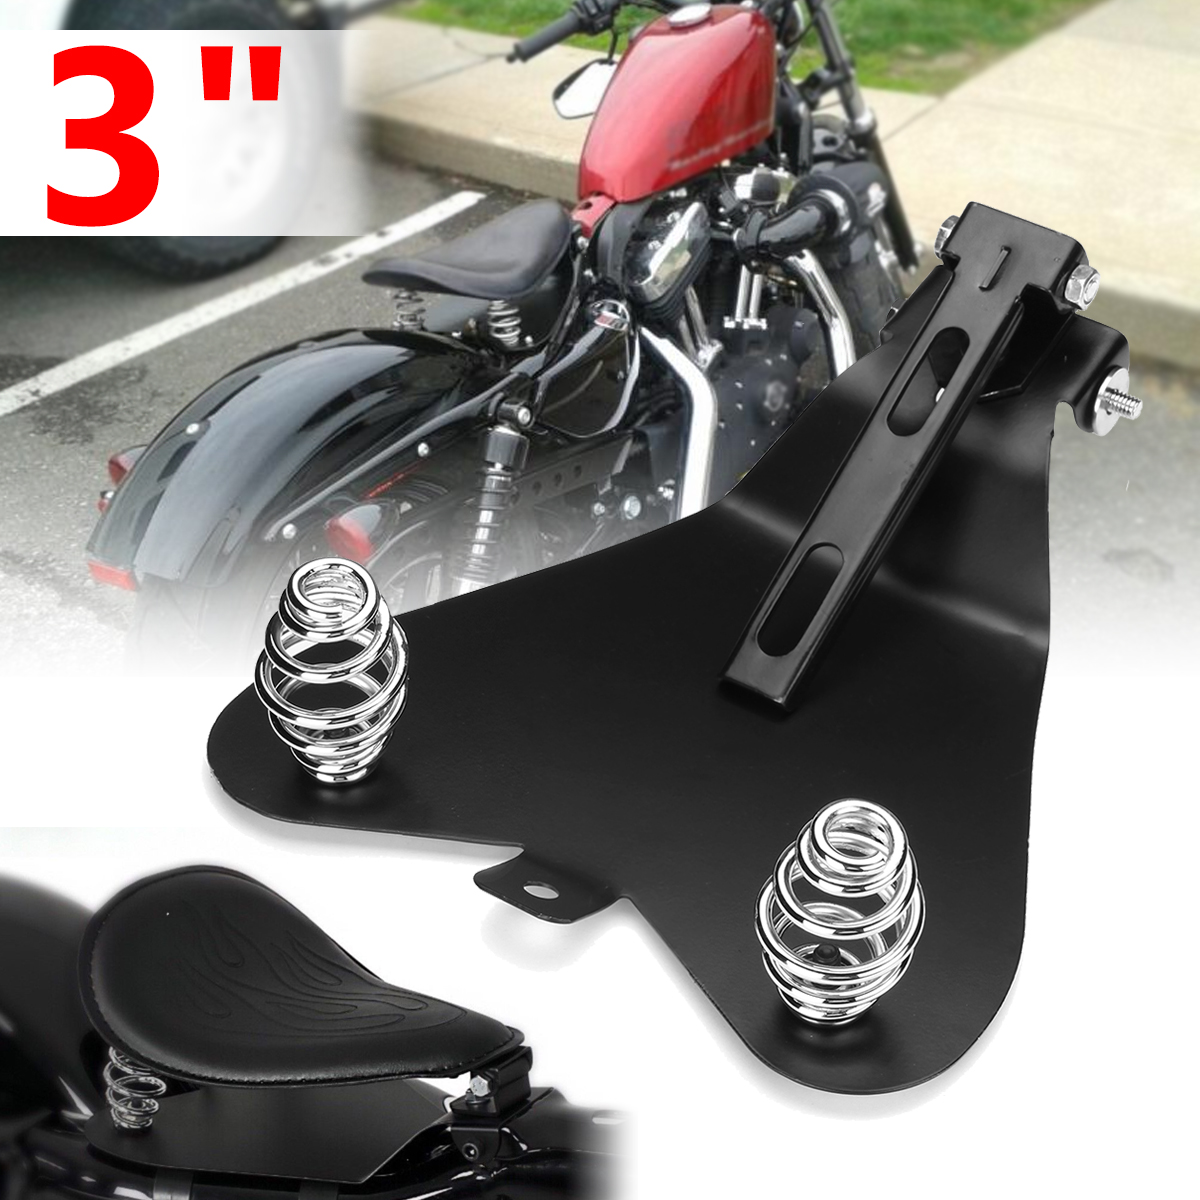 3inch Universal Motorcycle Seat Base Plate Spring Bracket Solo Seat Pad Saddle For Harley/Honda/Yamaha/Kawasaki/Suzuki/Sportster